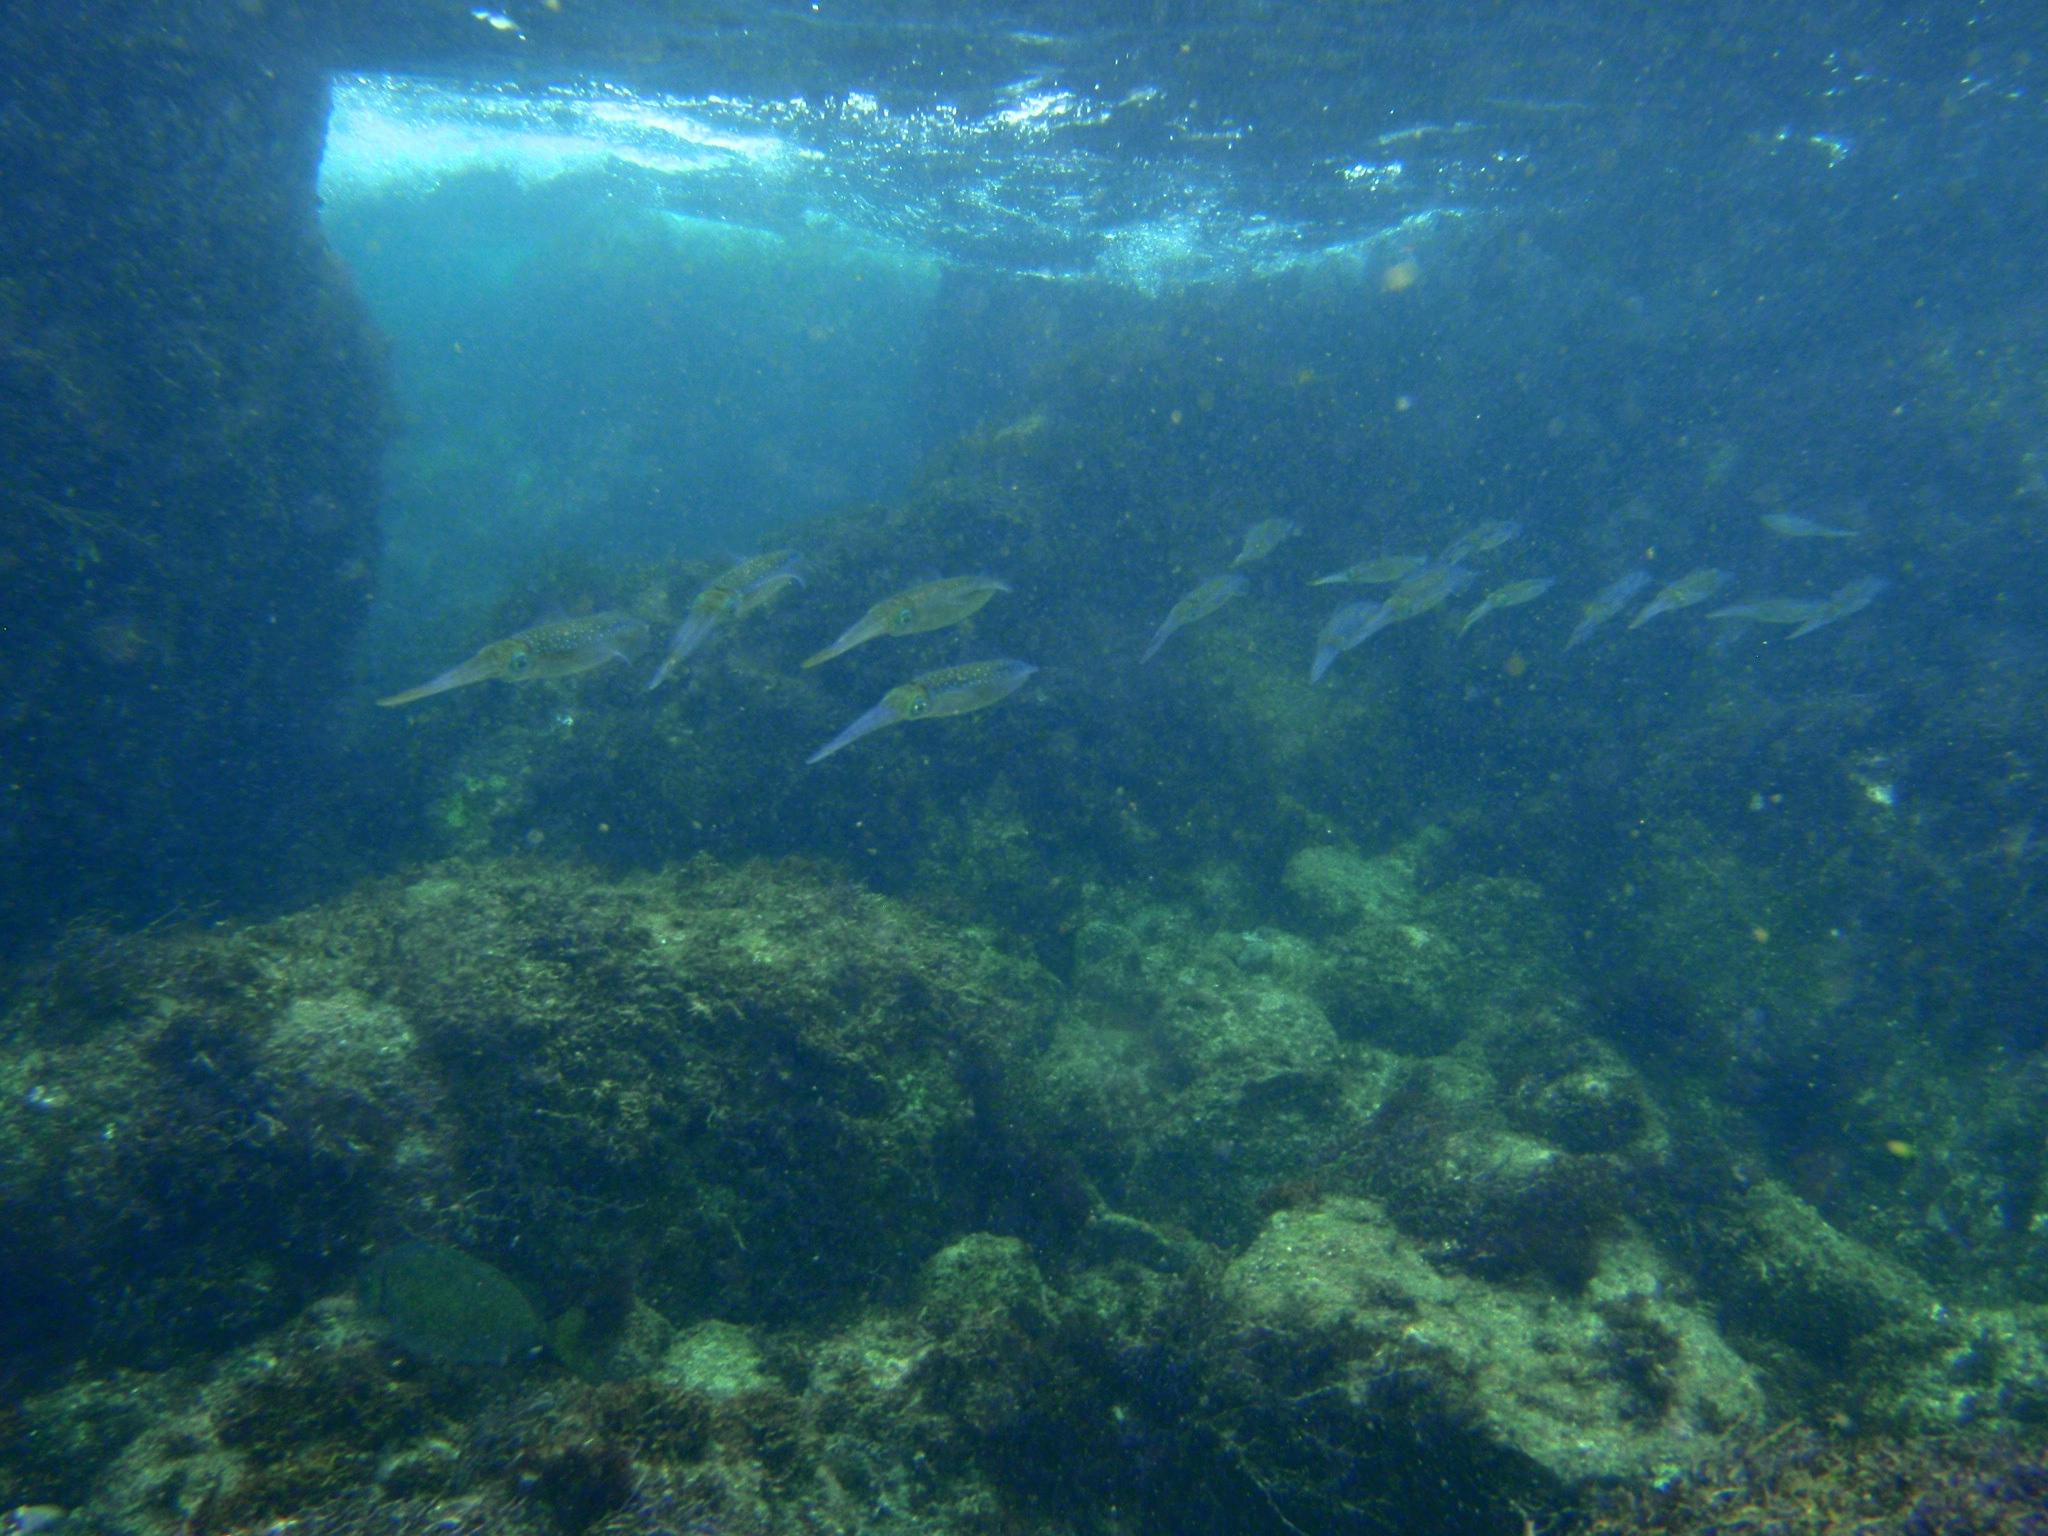 http://www.aquamarine-dive.net/blog/index.html/2014/08/27/P8253233_1.JPG